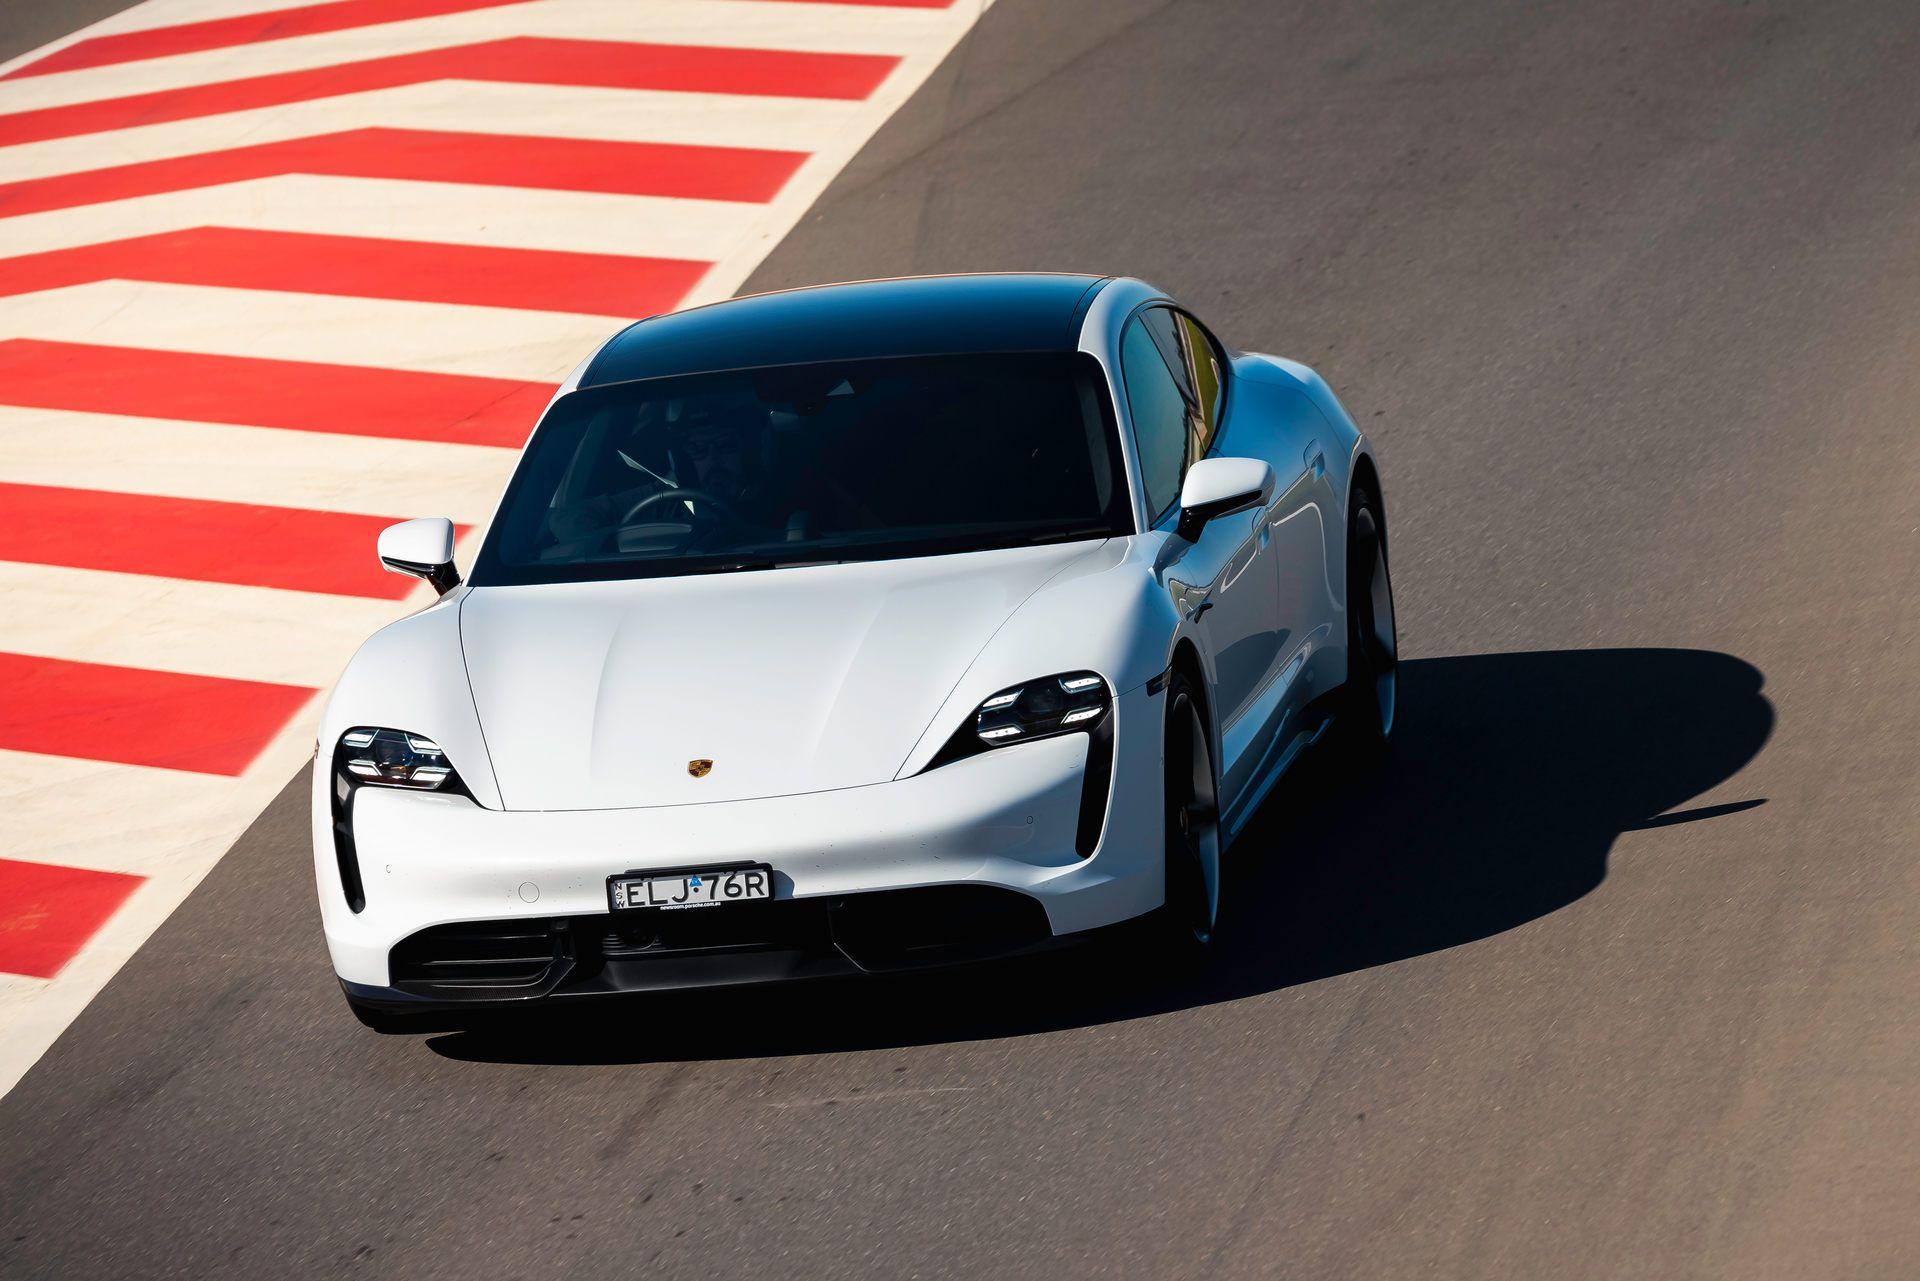 Porsche-Taycan-Turbo-S-The-Bend-Motorsport-Park-1